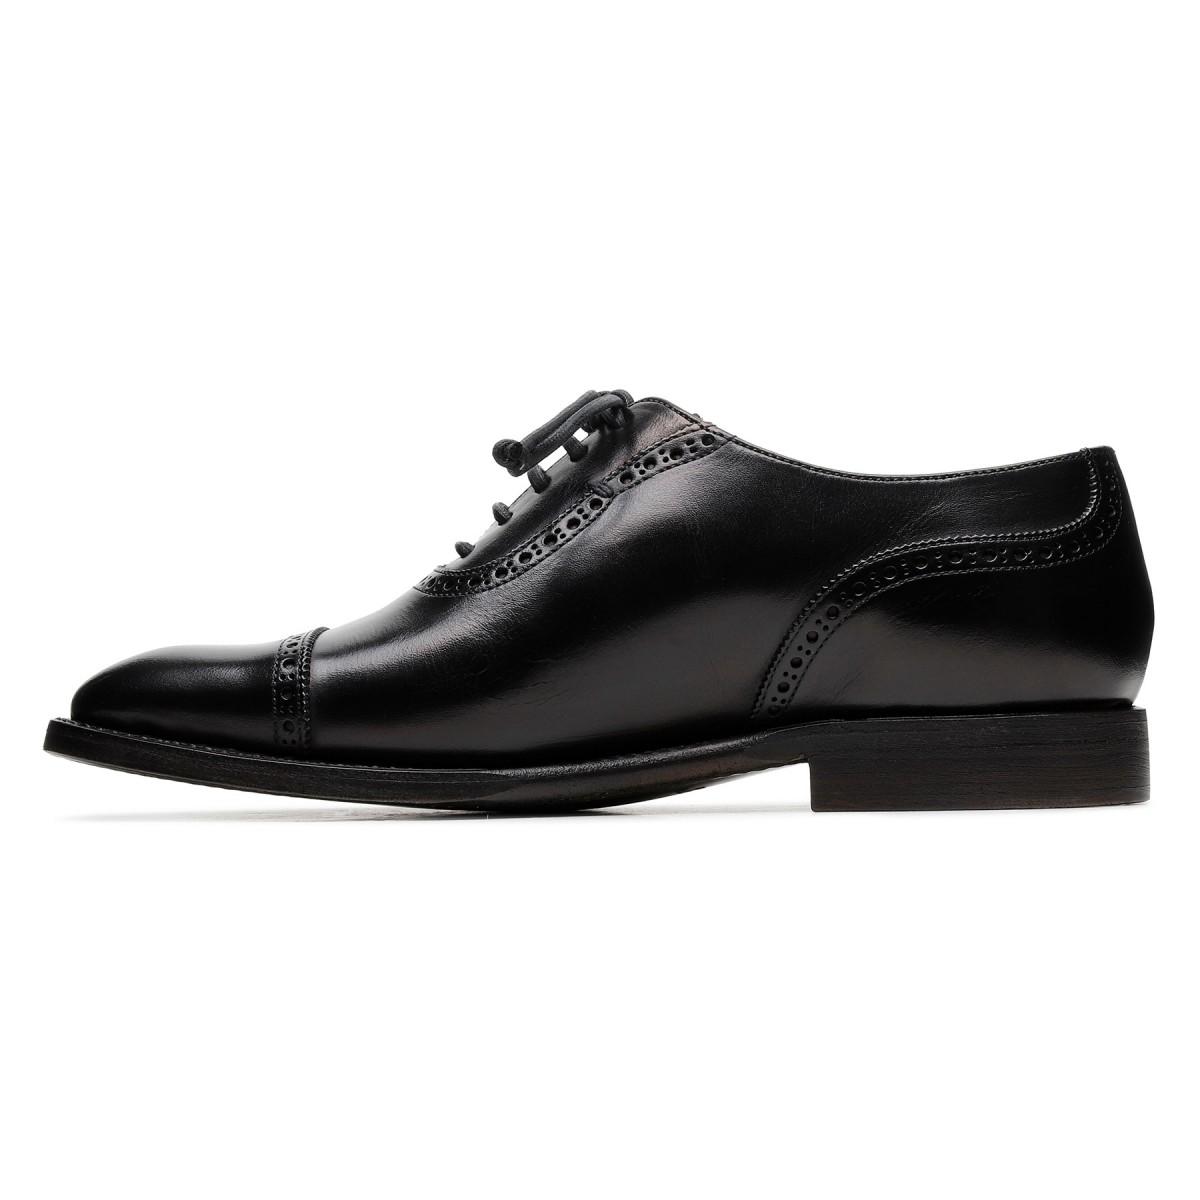 Lione black leather lace-up shoes